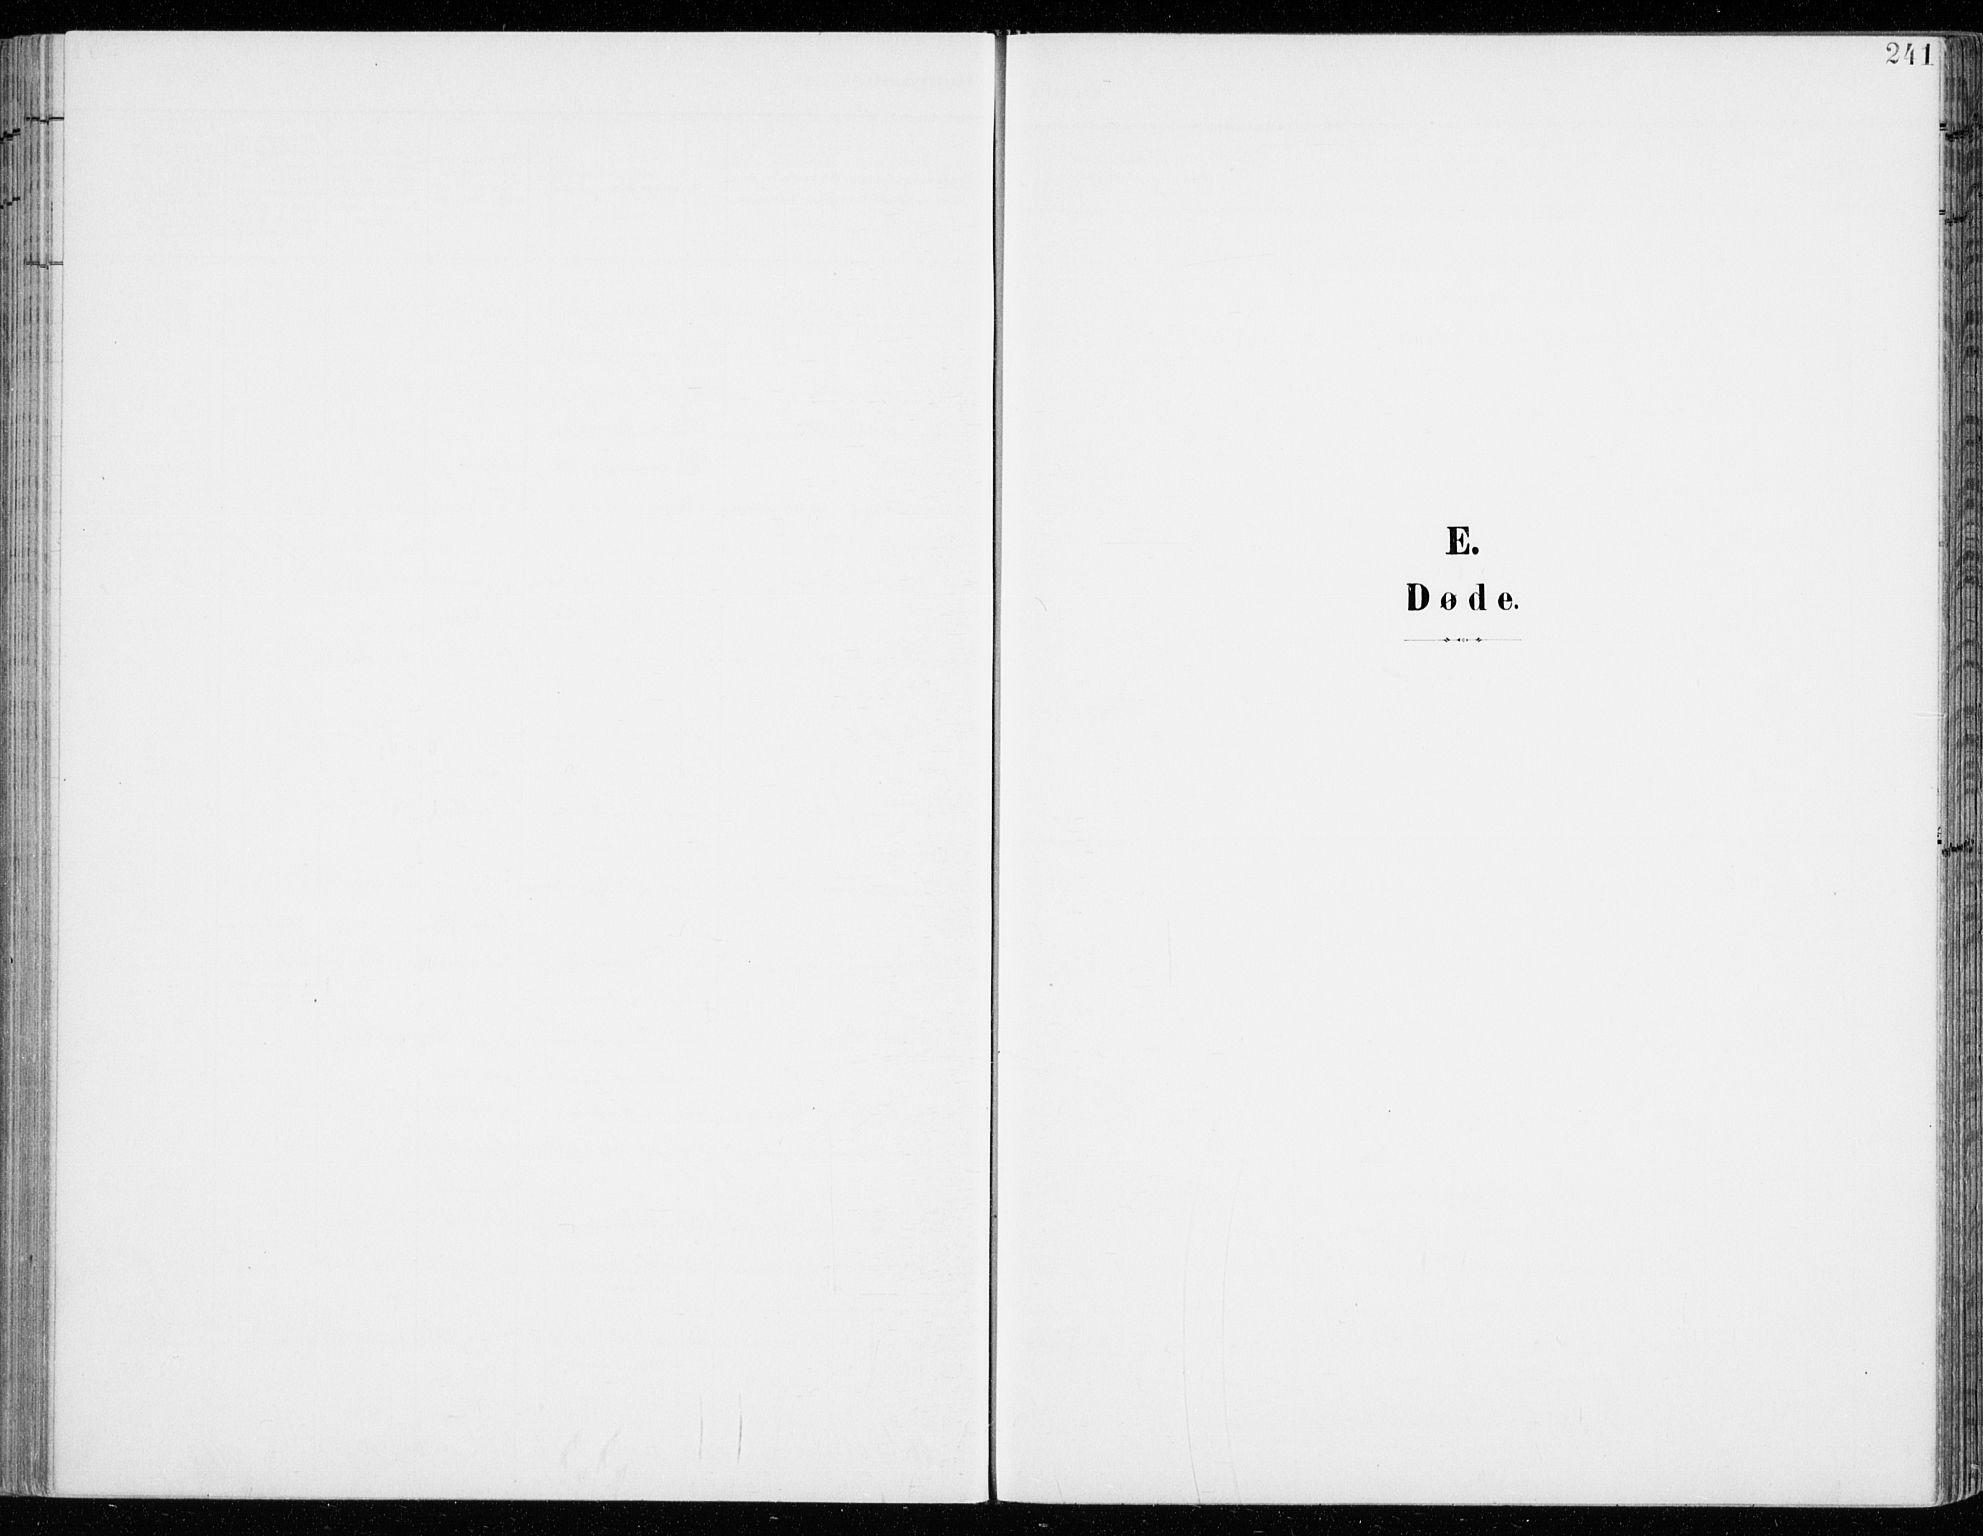 SAH, Fåberg prestekontor, Ministerialbok nr. 11, 1899-1913, s. 241